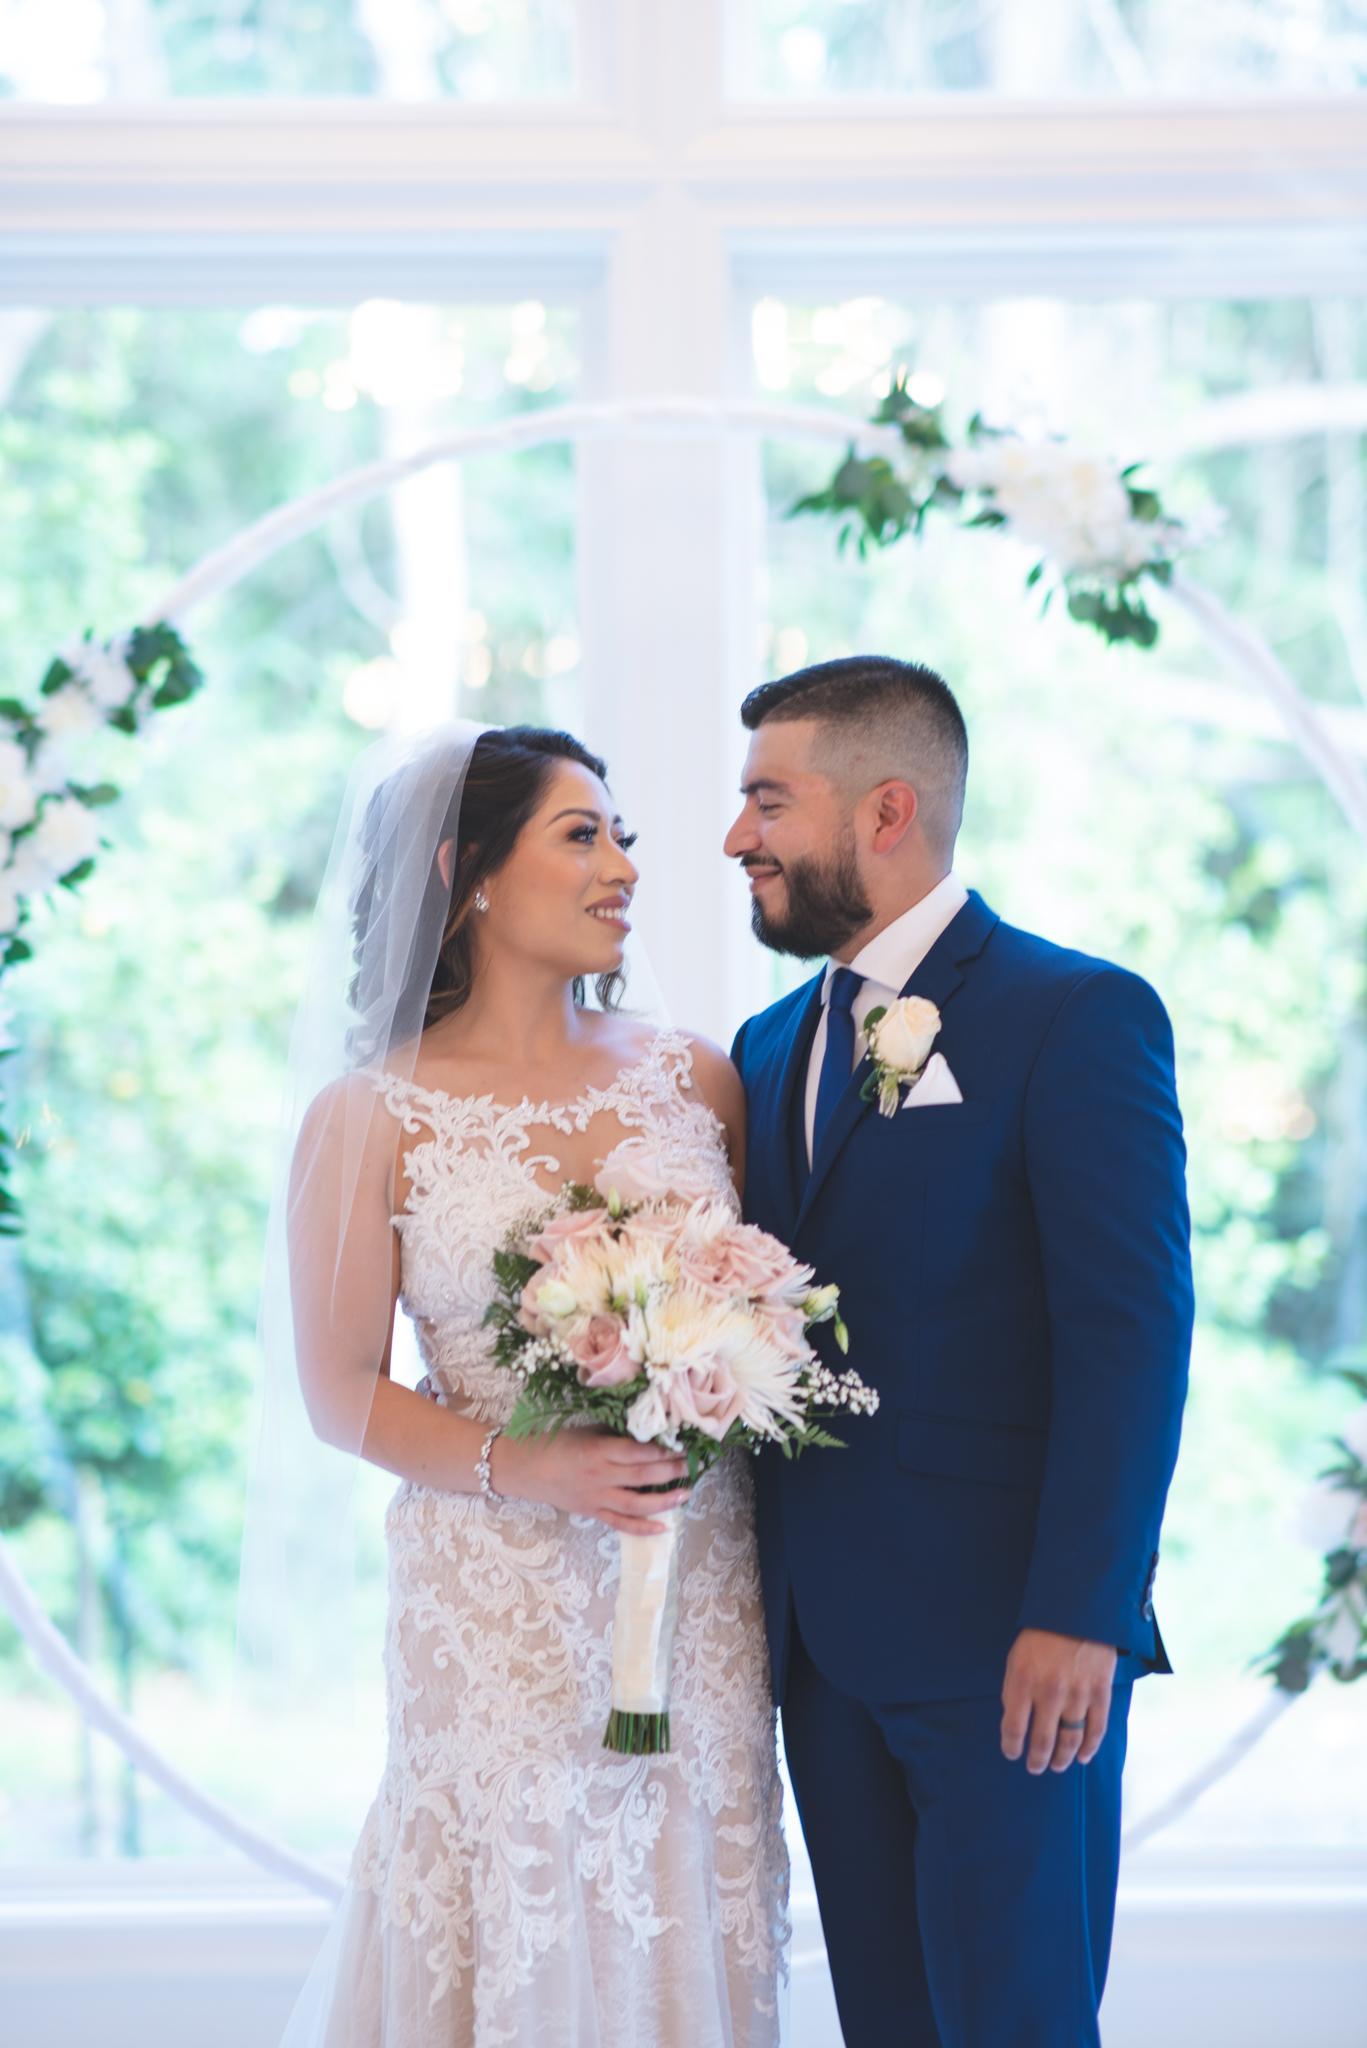 Sandlewood Manor Wedding